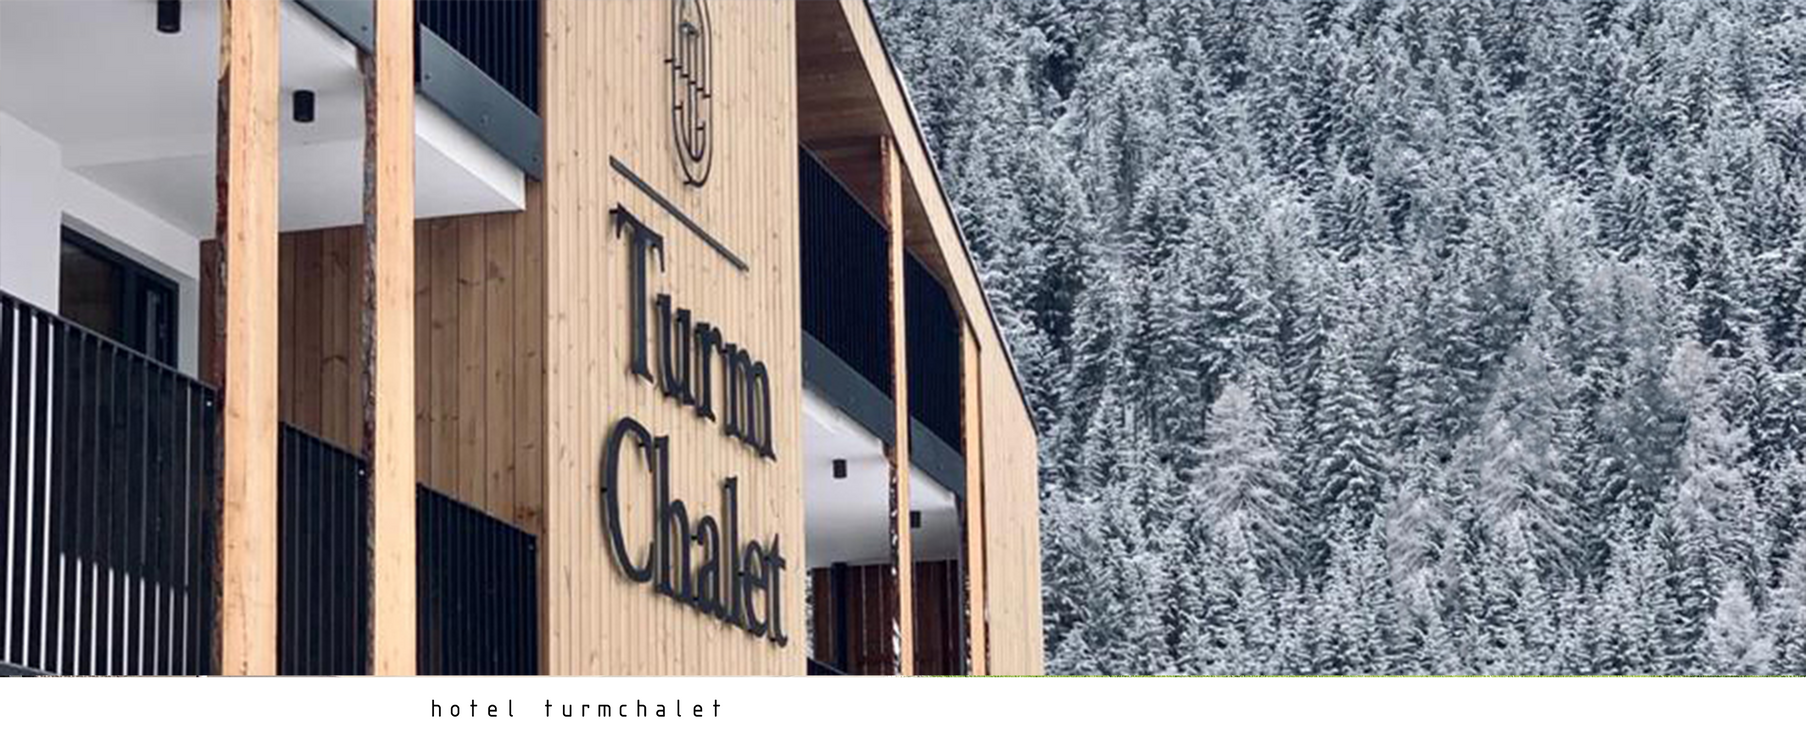 hotel_turmchalet.png